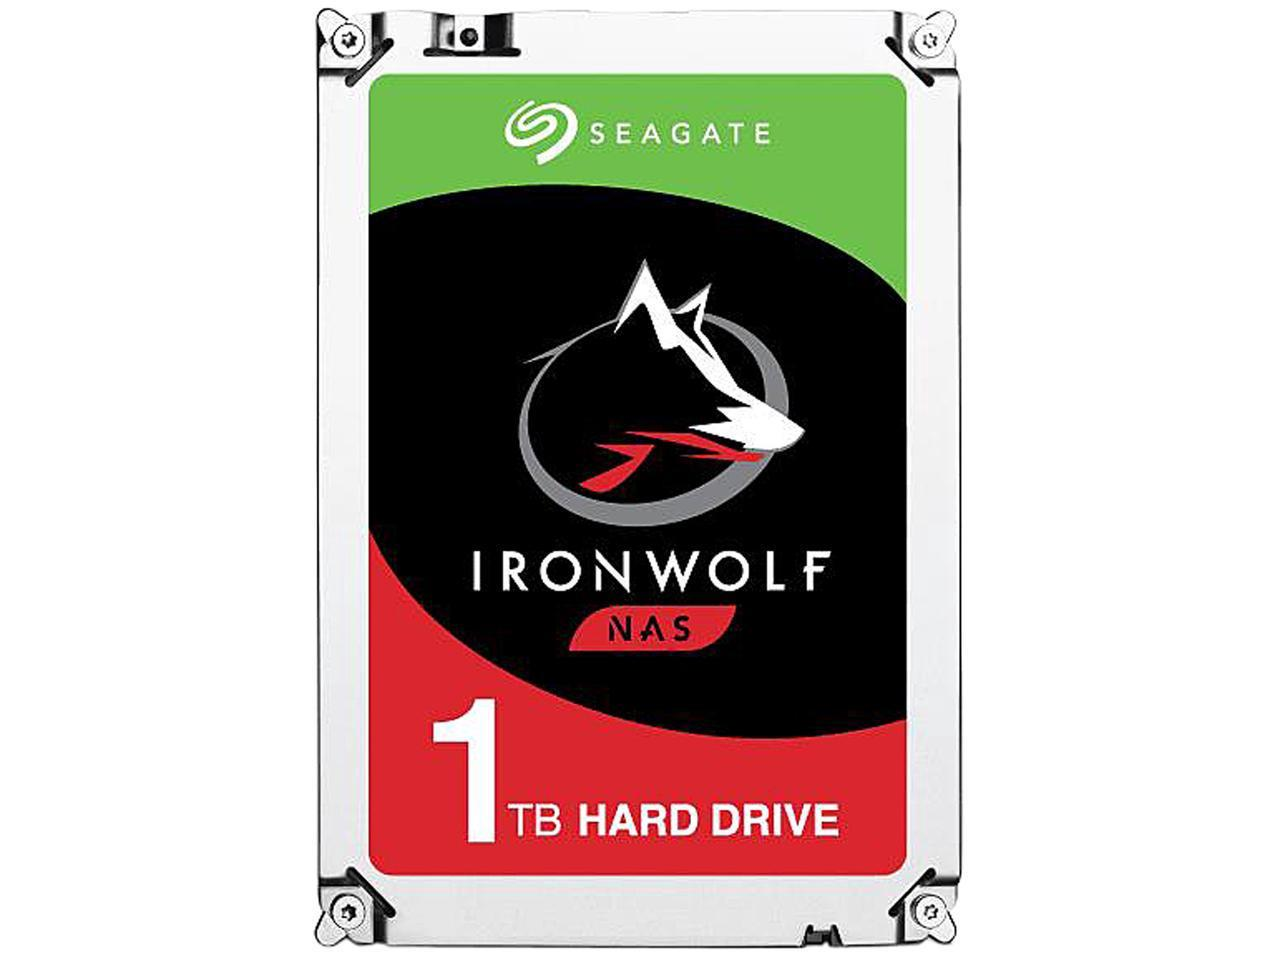 Seagate 1TB Internal IronWolf SATA 3.5 Hard Drive